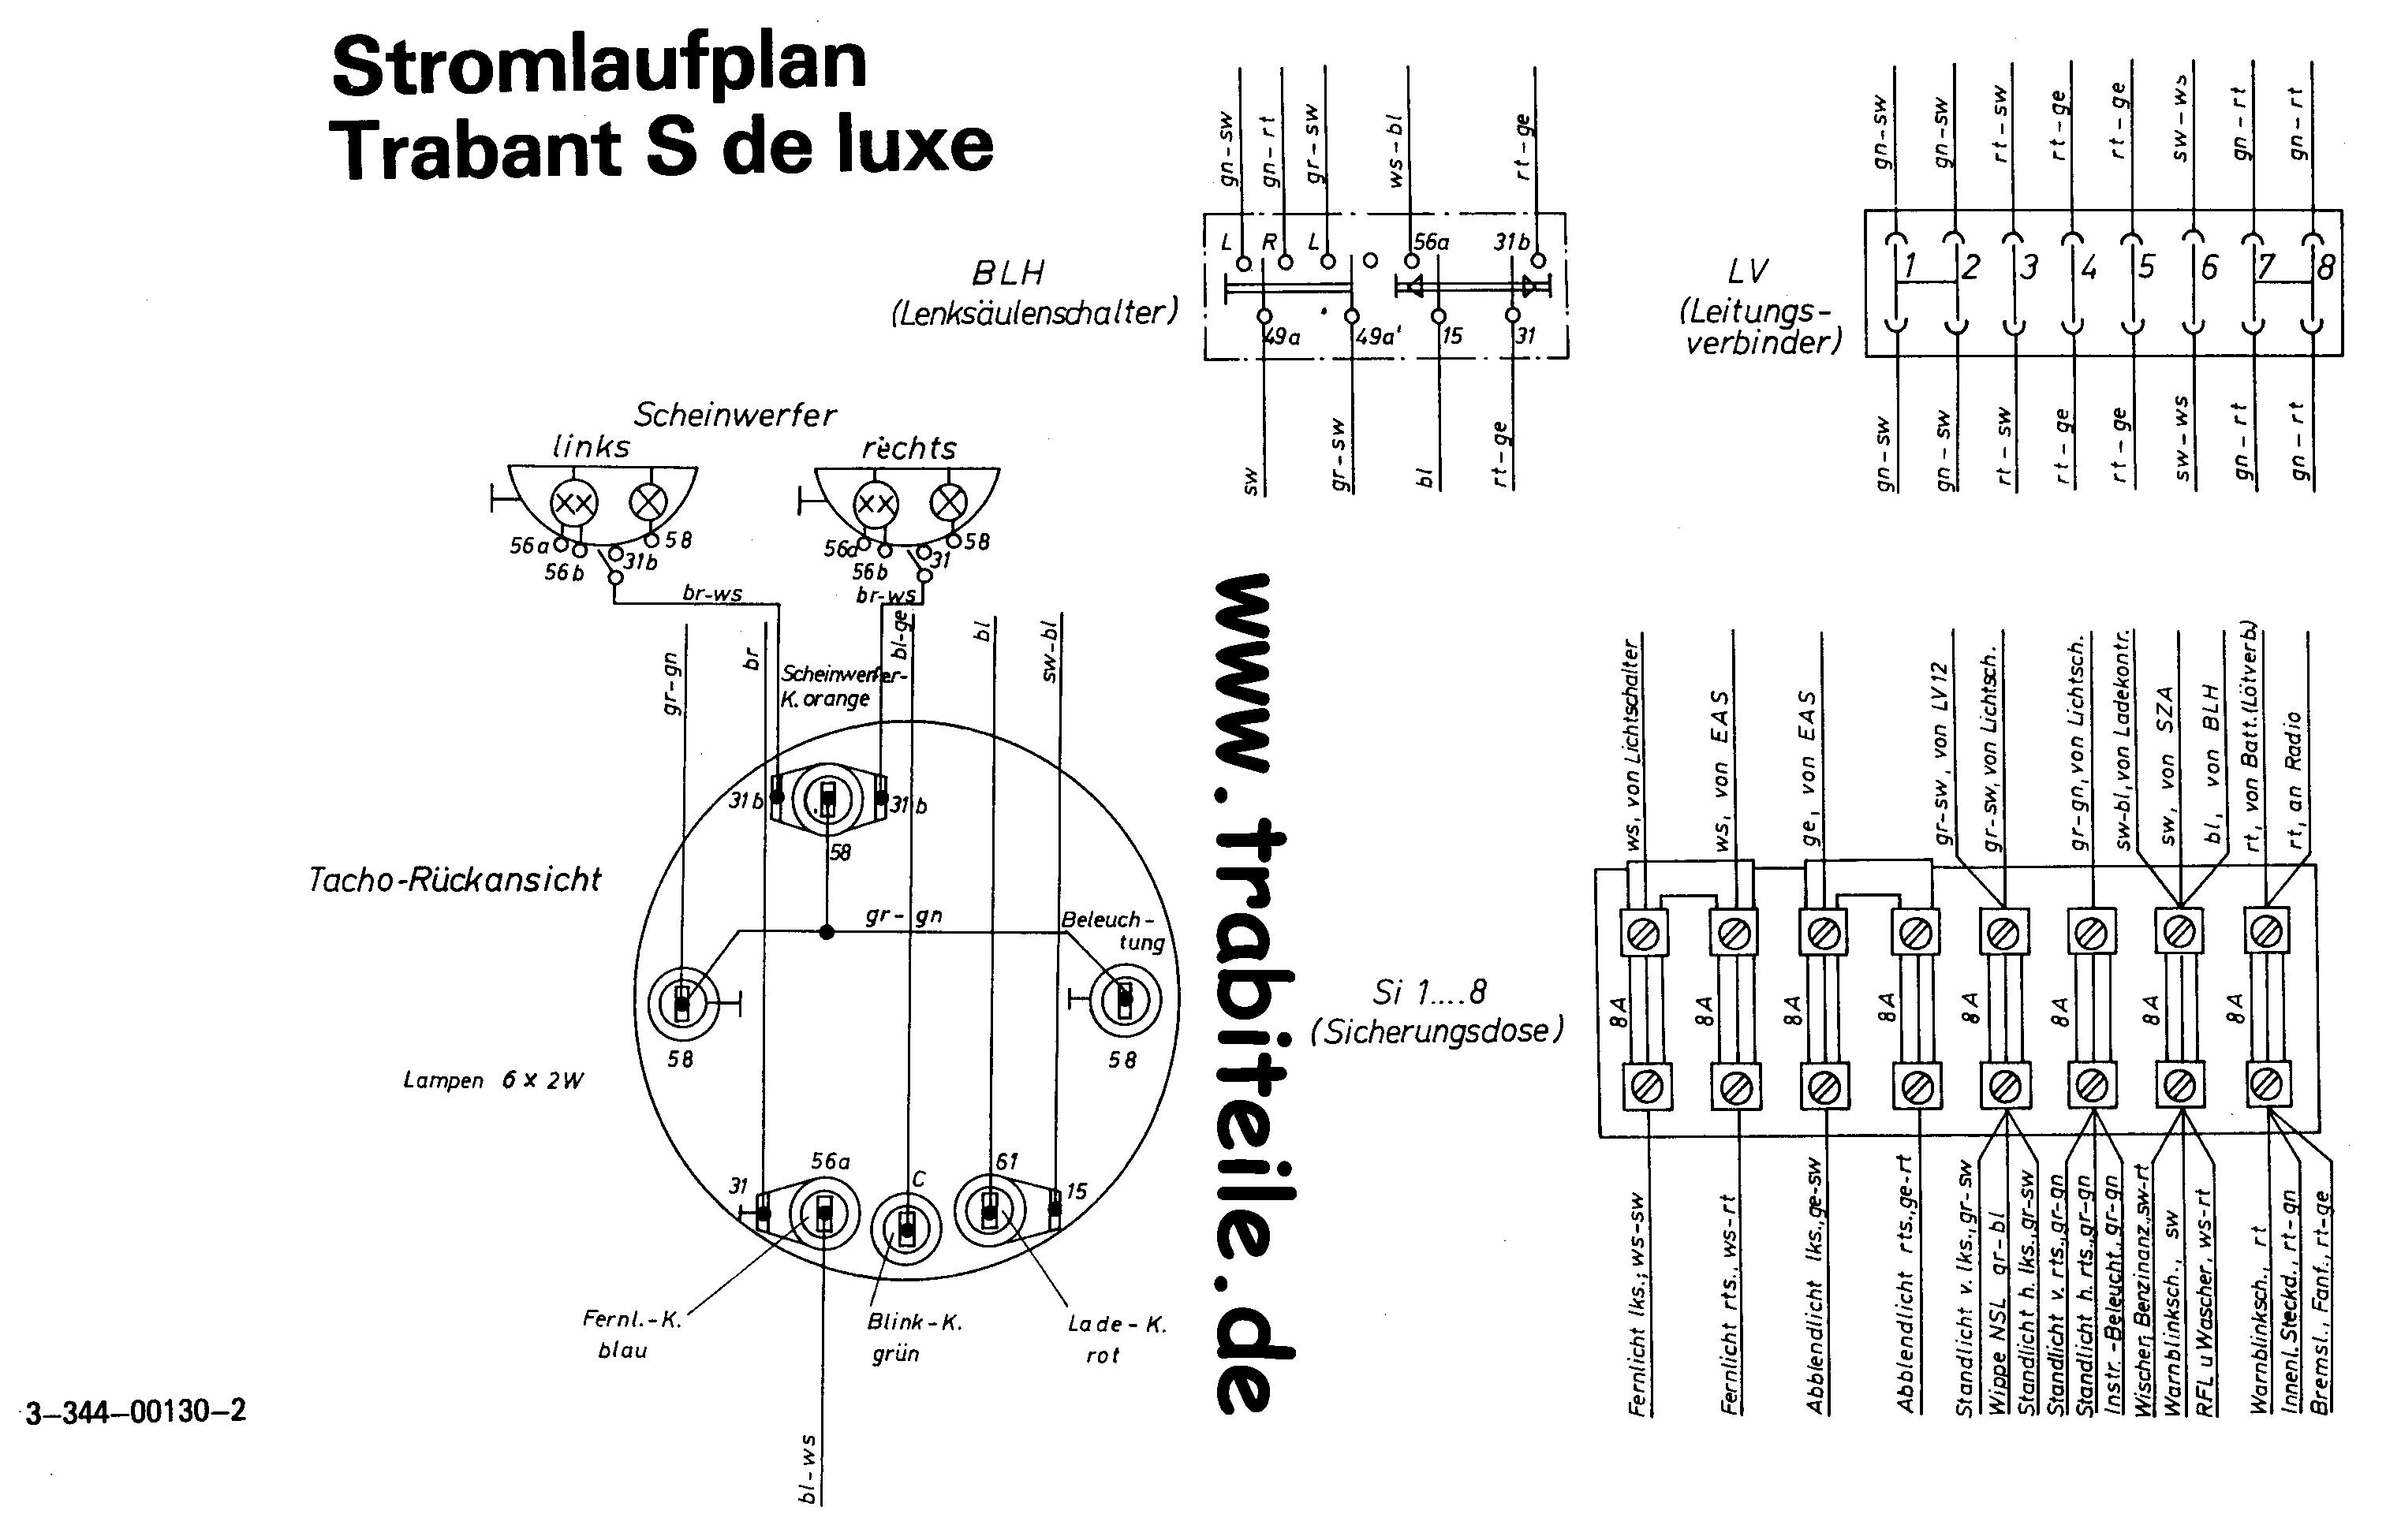 Trabant E-Zündung Schaltplan - Technik [Allgemein] - PappenForum.de